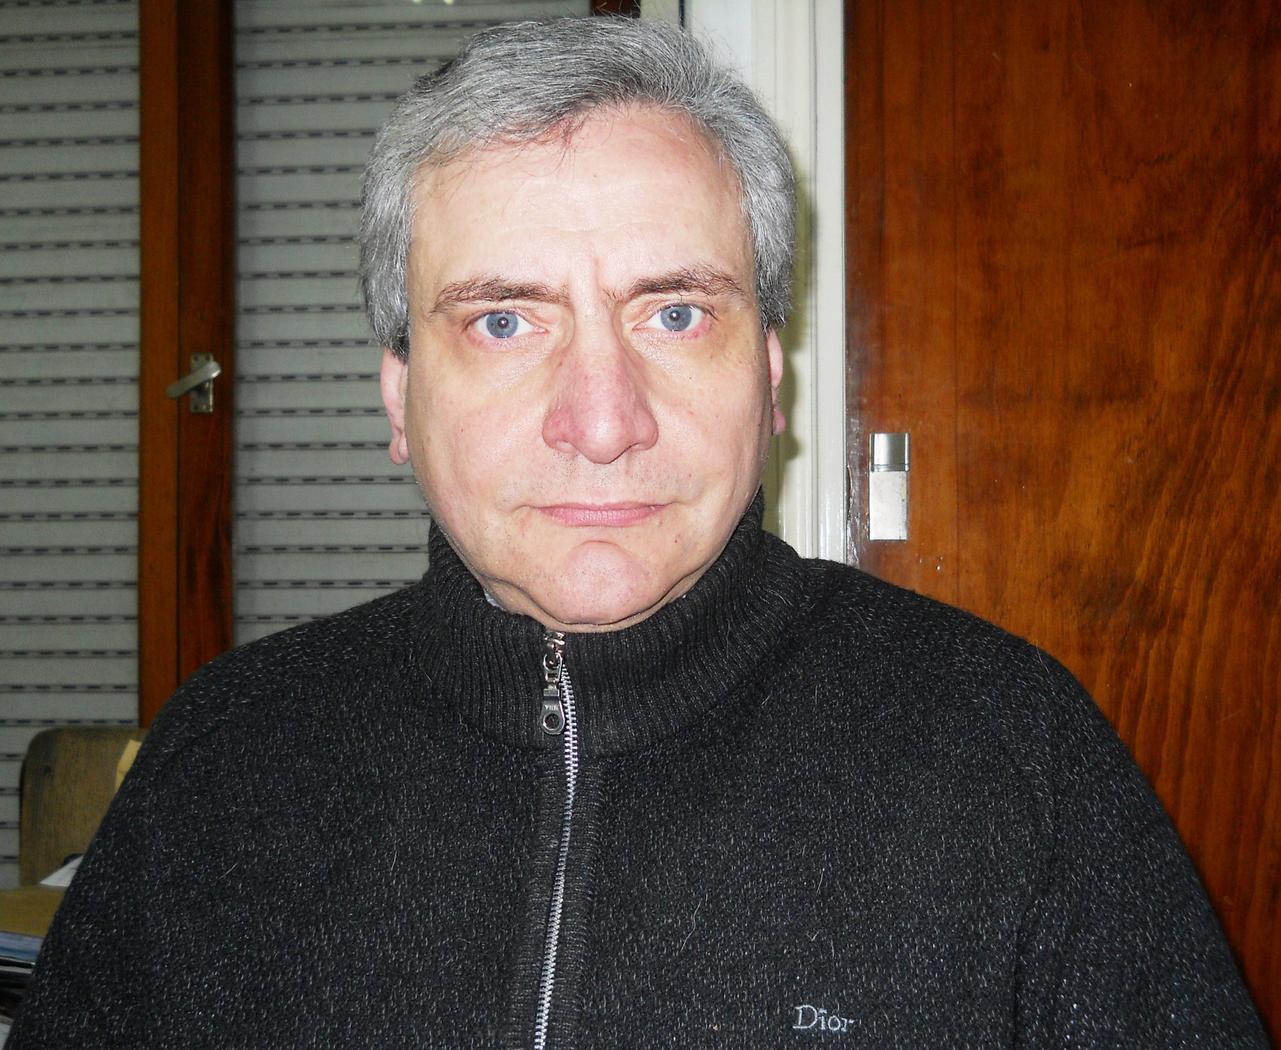 Daniel Eber Mendive